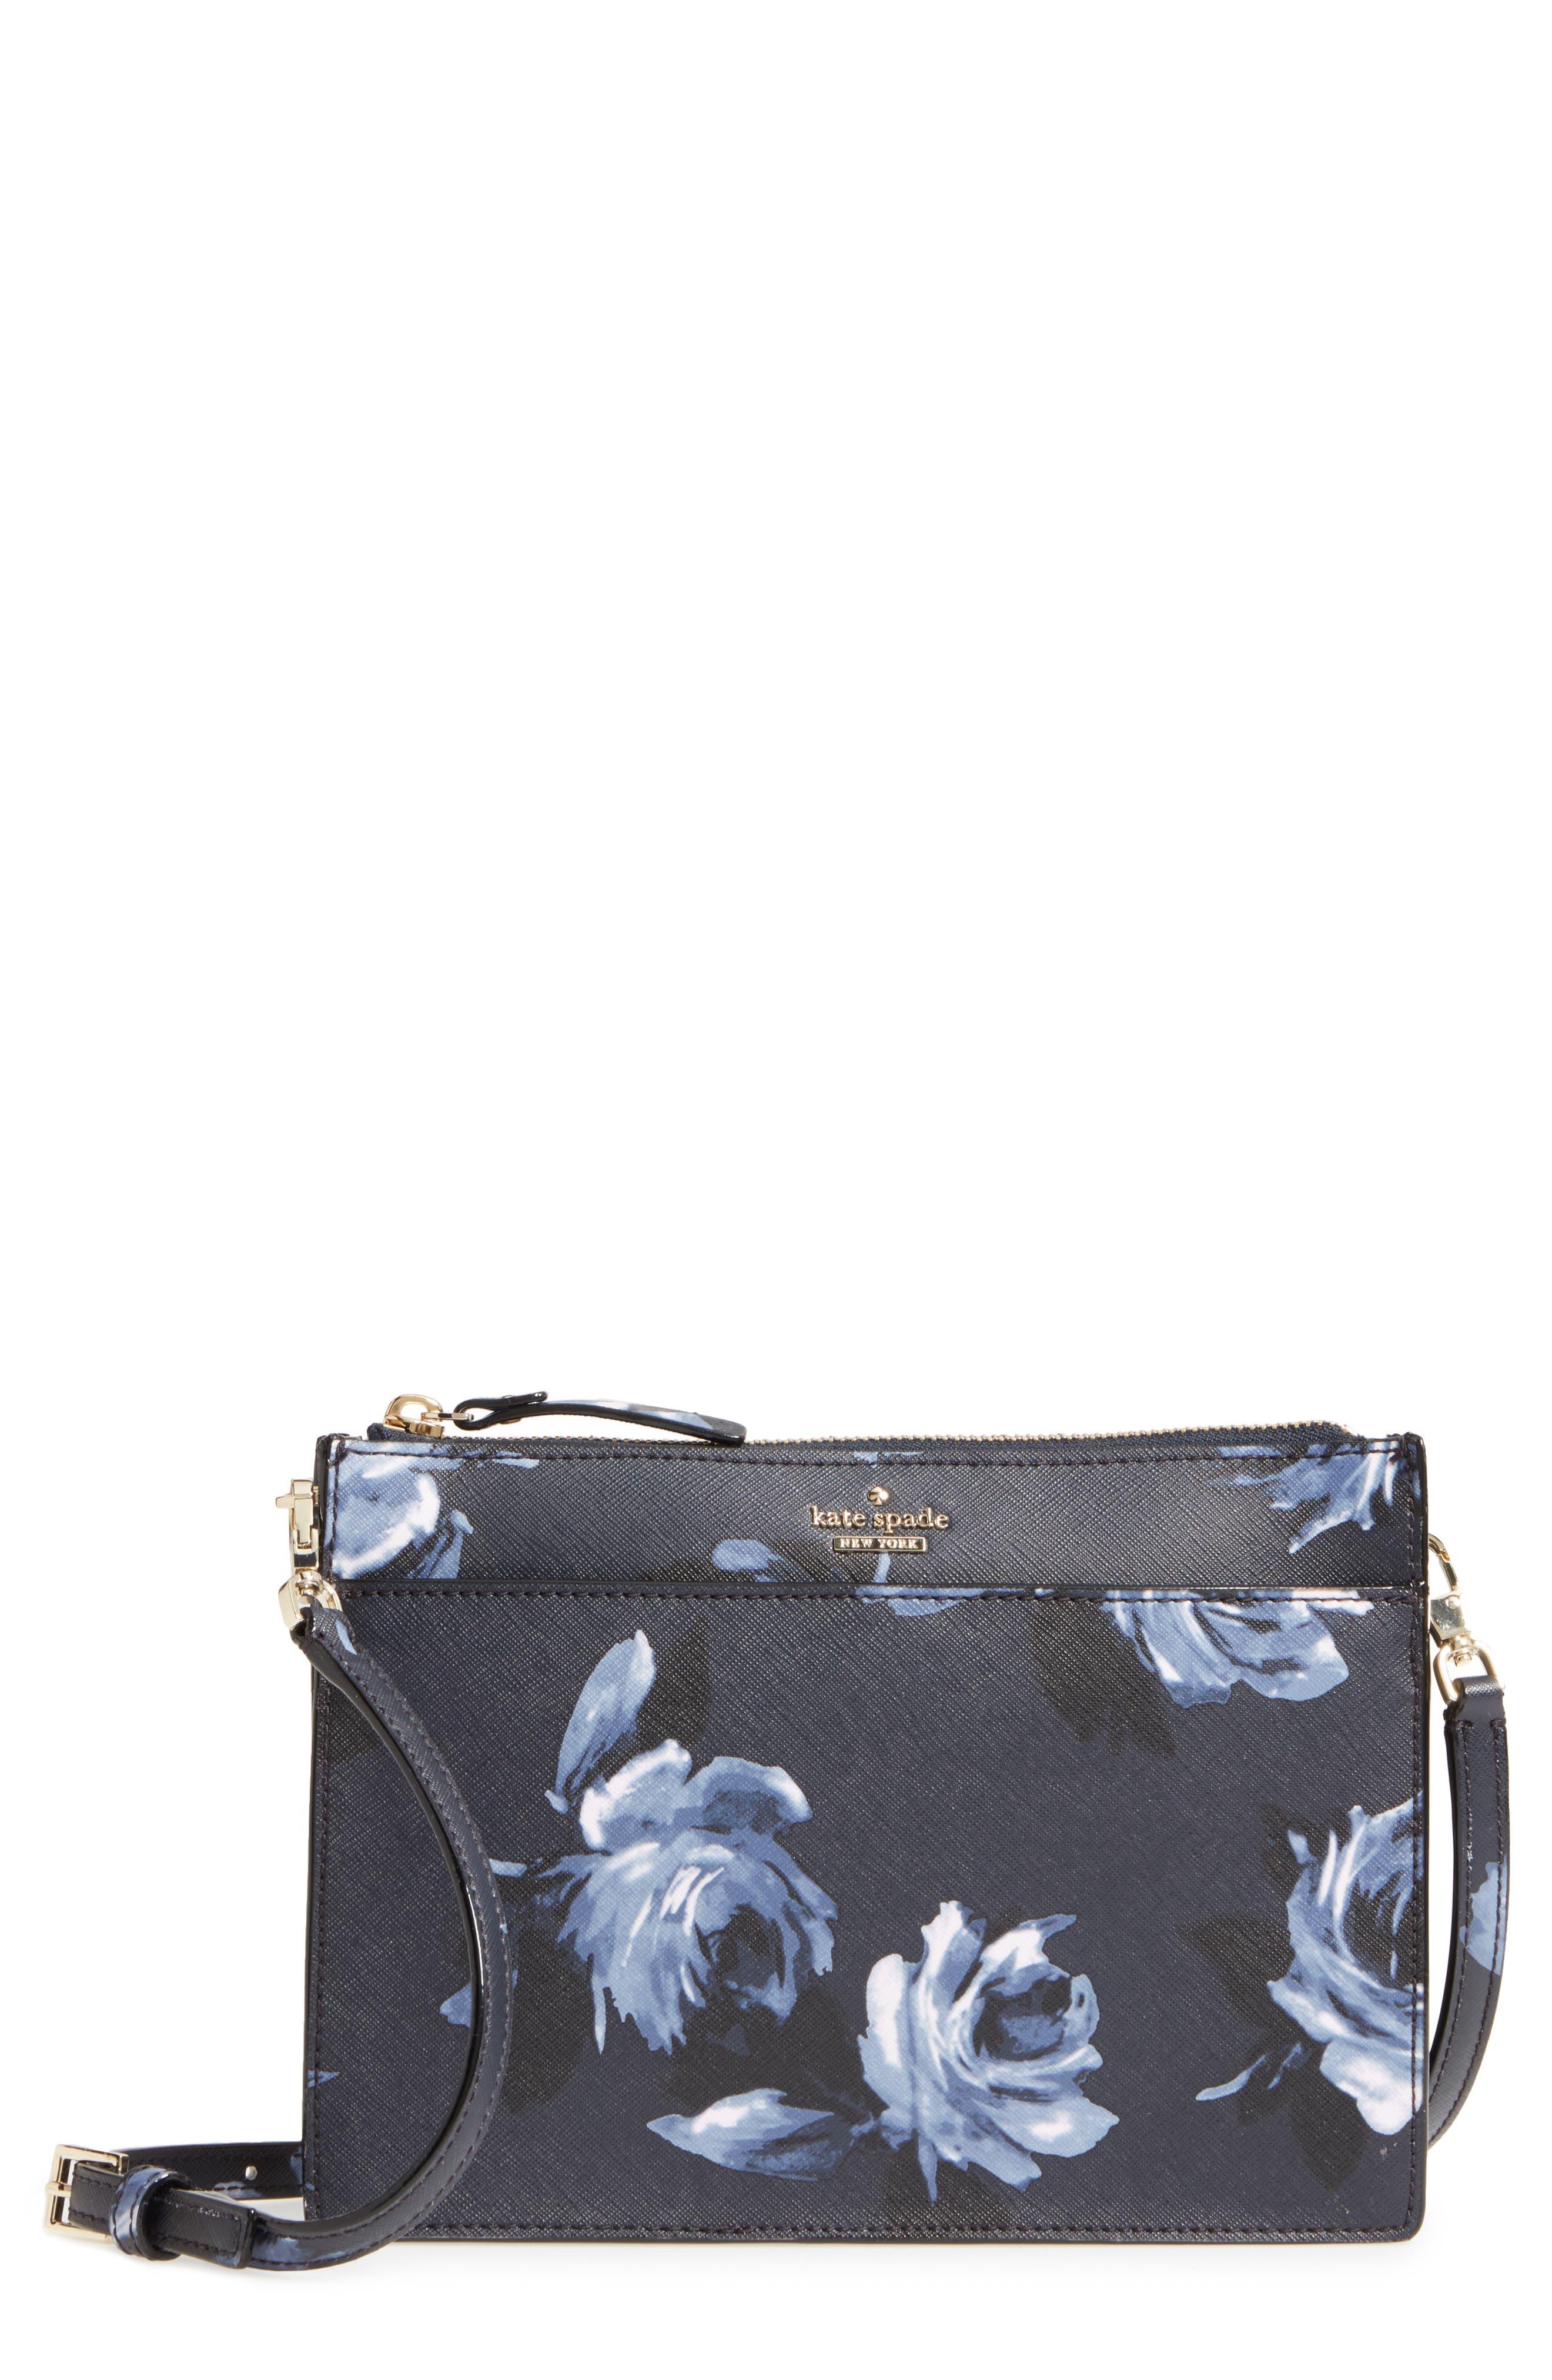 Alternate Image 1 Selected - kate spade new york cameron street clarise leather shoulder bag